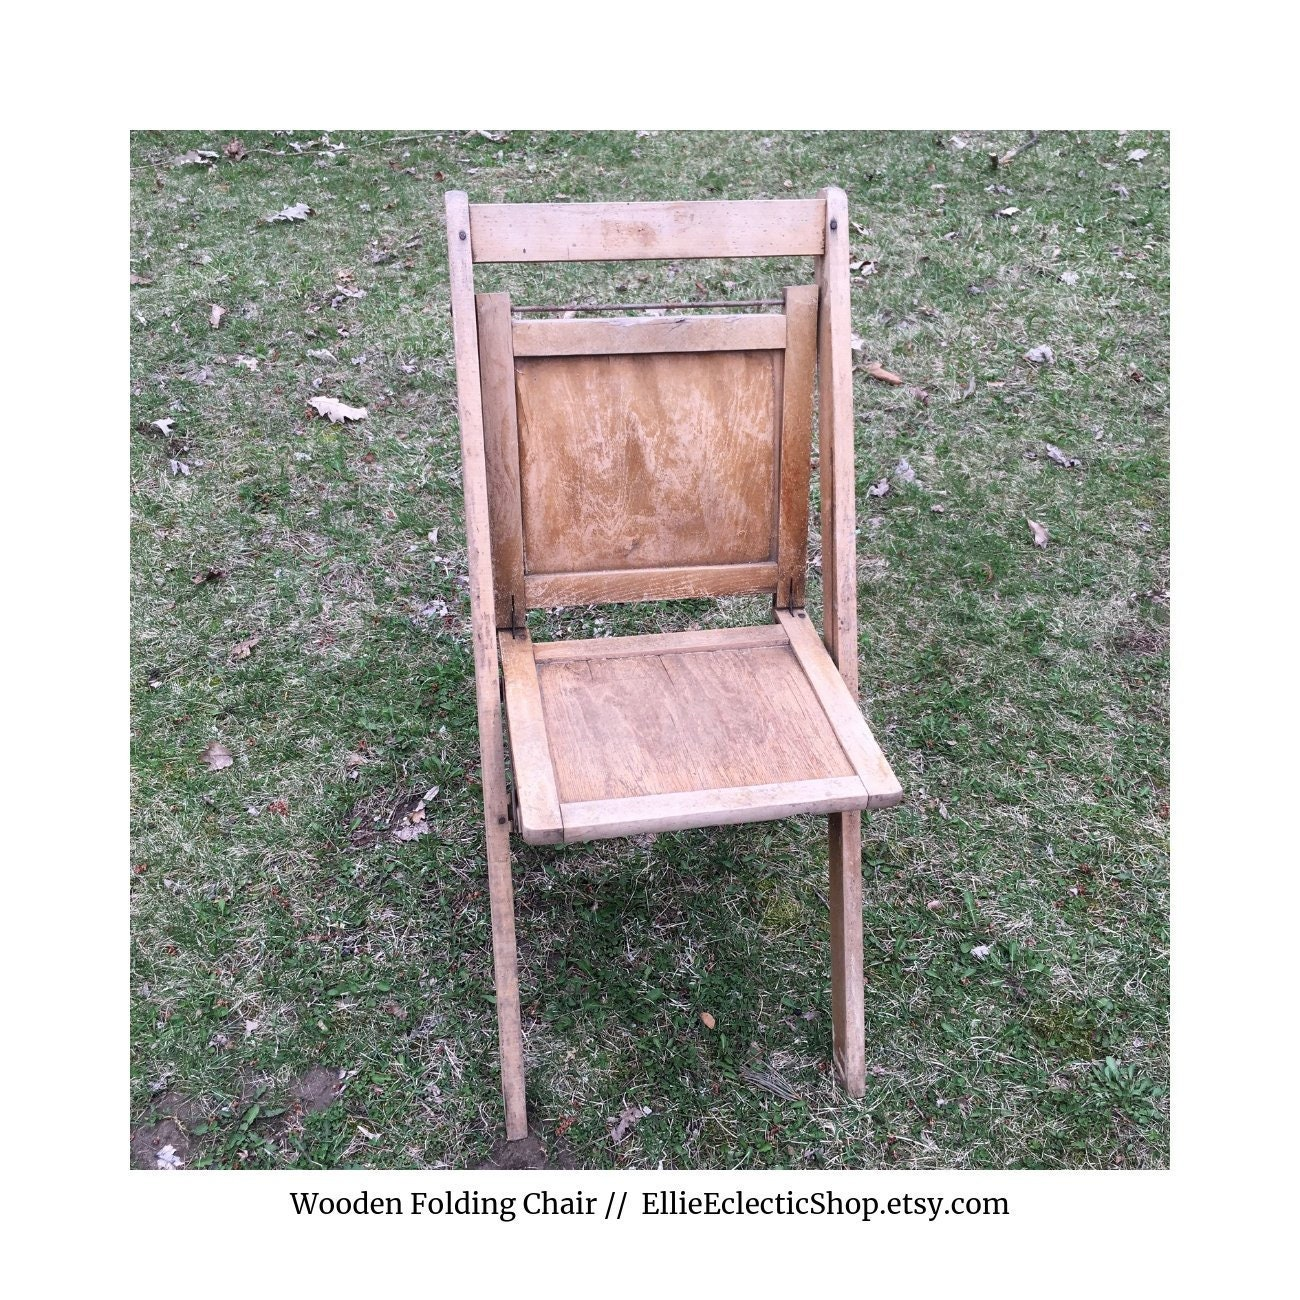 Vintage Wooden Folding Chair Antique Wood Chair Farmhouse Decor Farmhouse Furniture Entryway Decor Rustic Home Decor